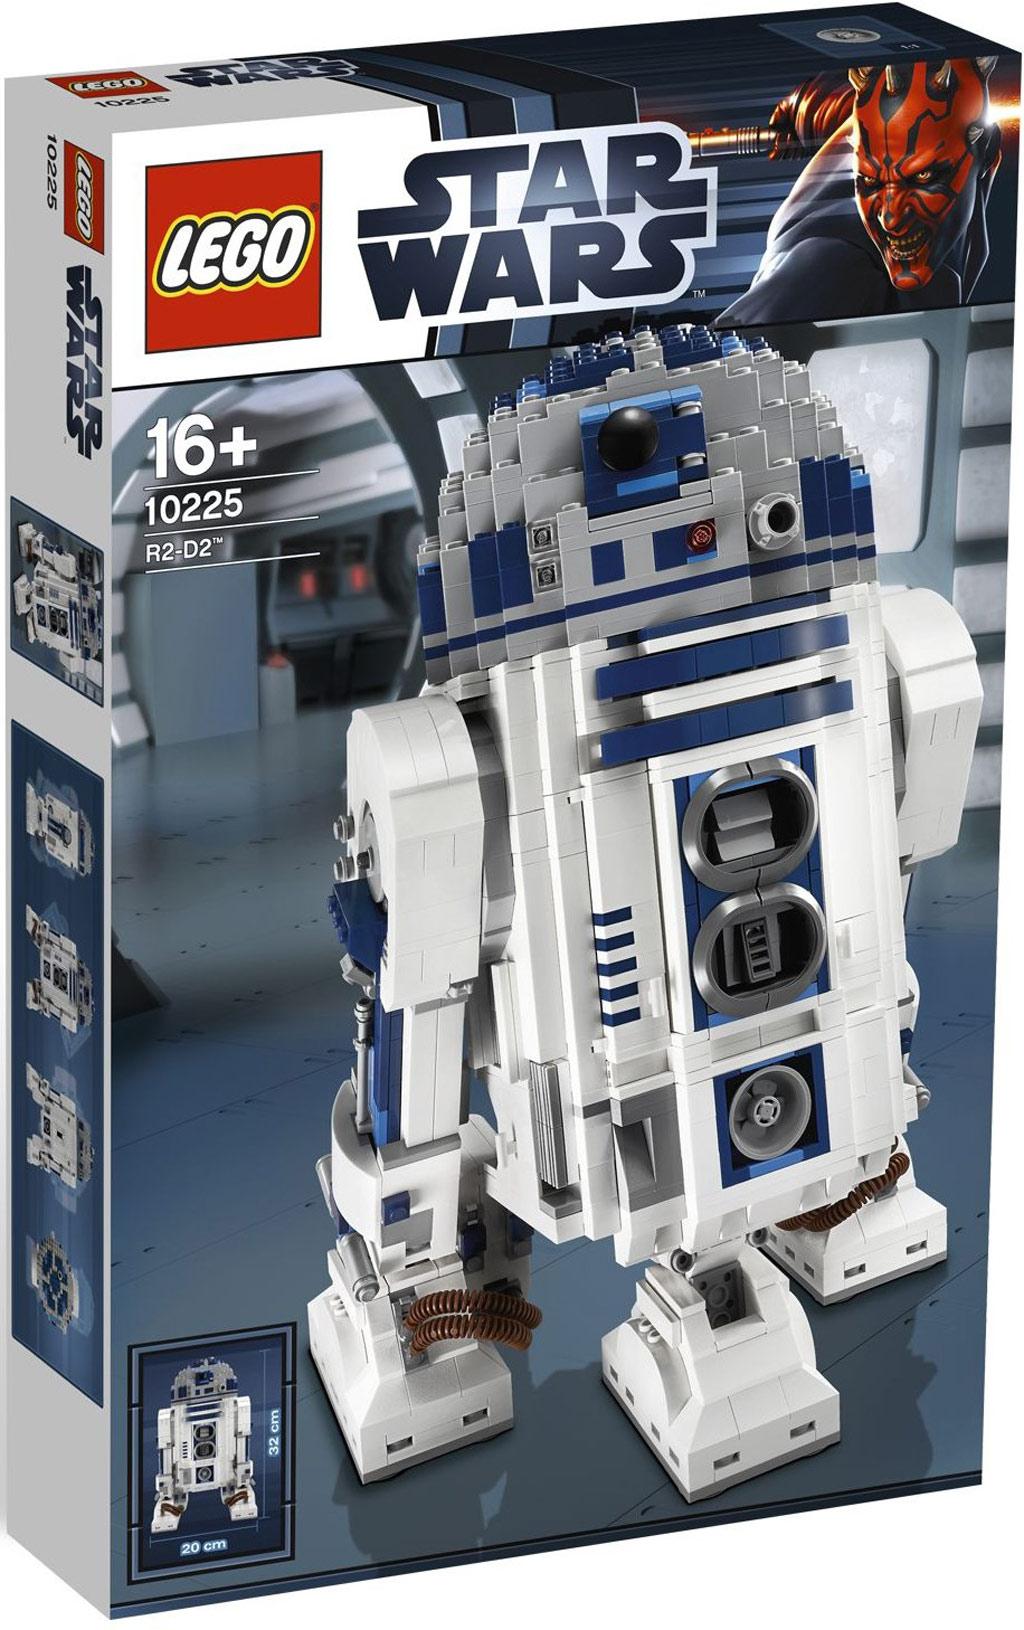 lego-star-wars-ucs-r2-d2-10225-box zusammengebaut.com